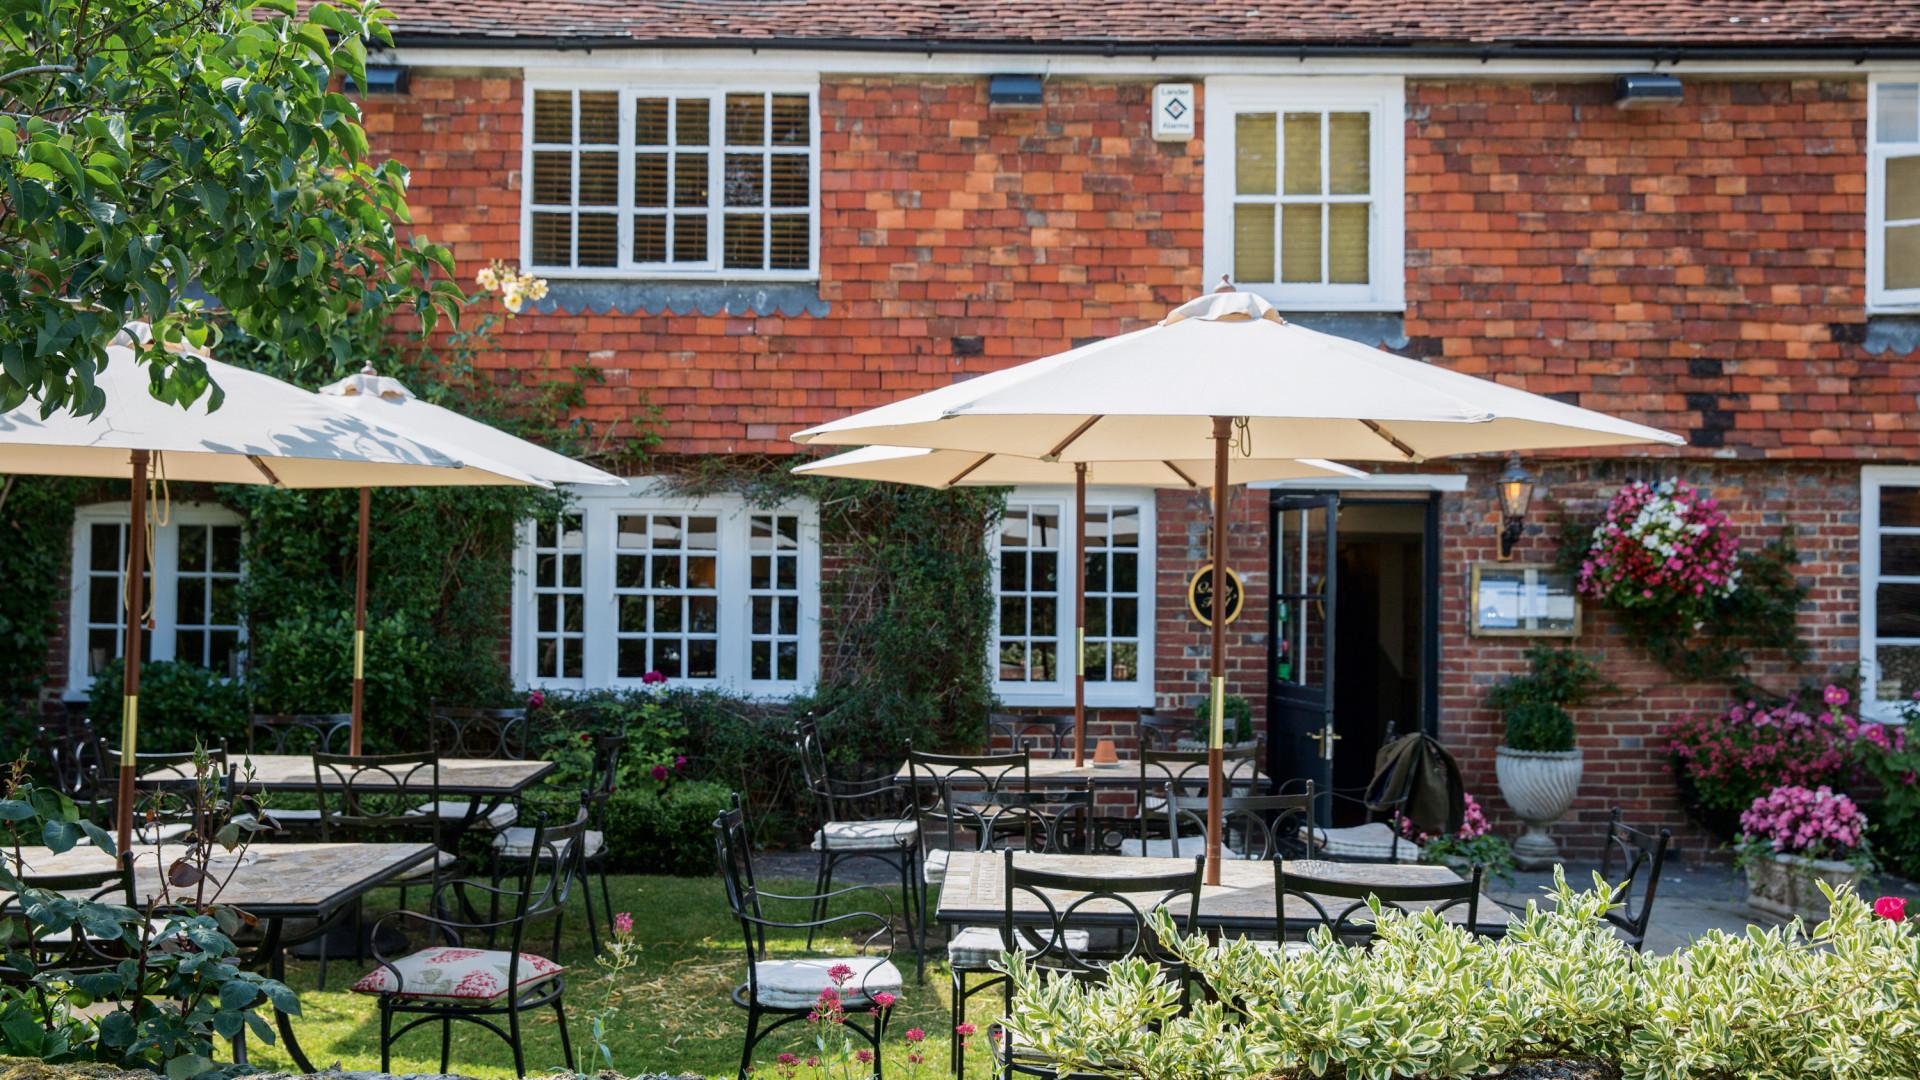 Sunny pub beer garden in Sussex, southeast England